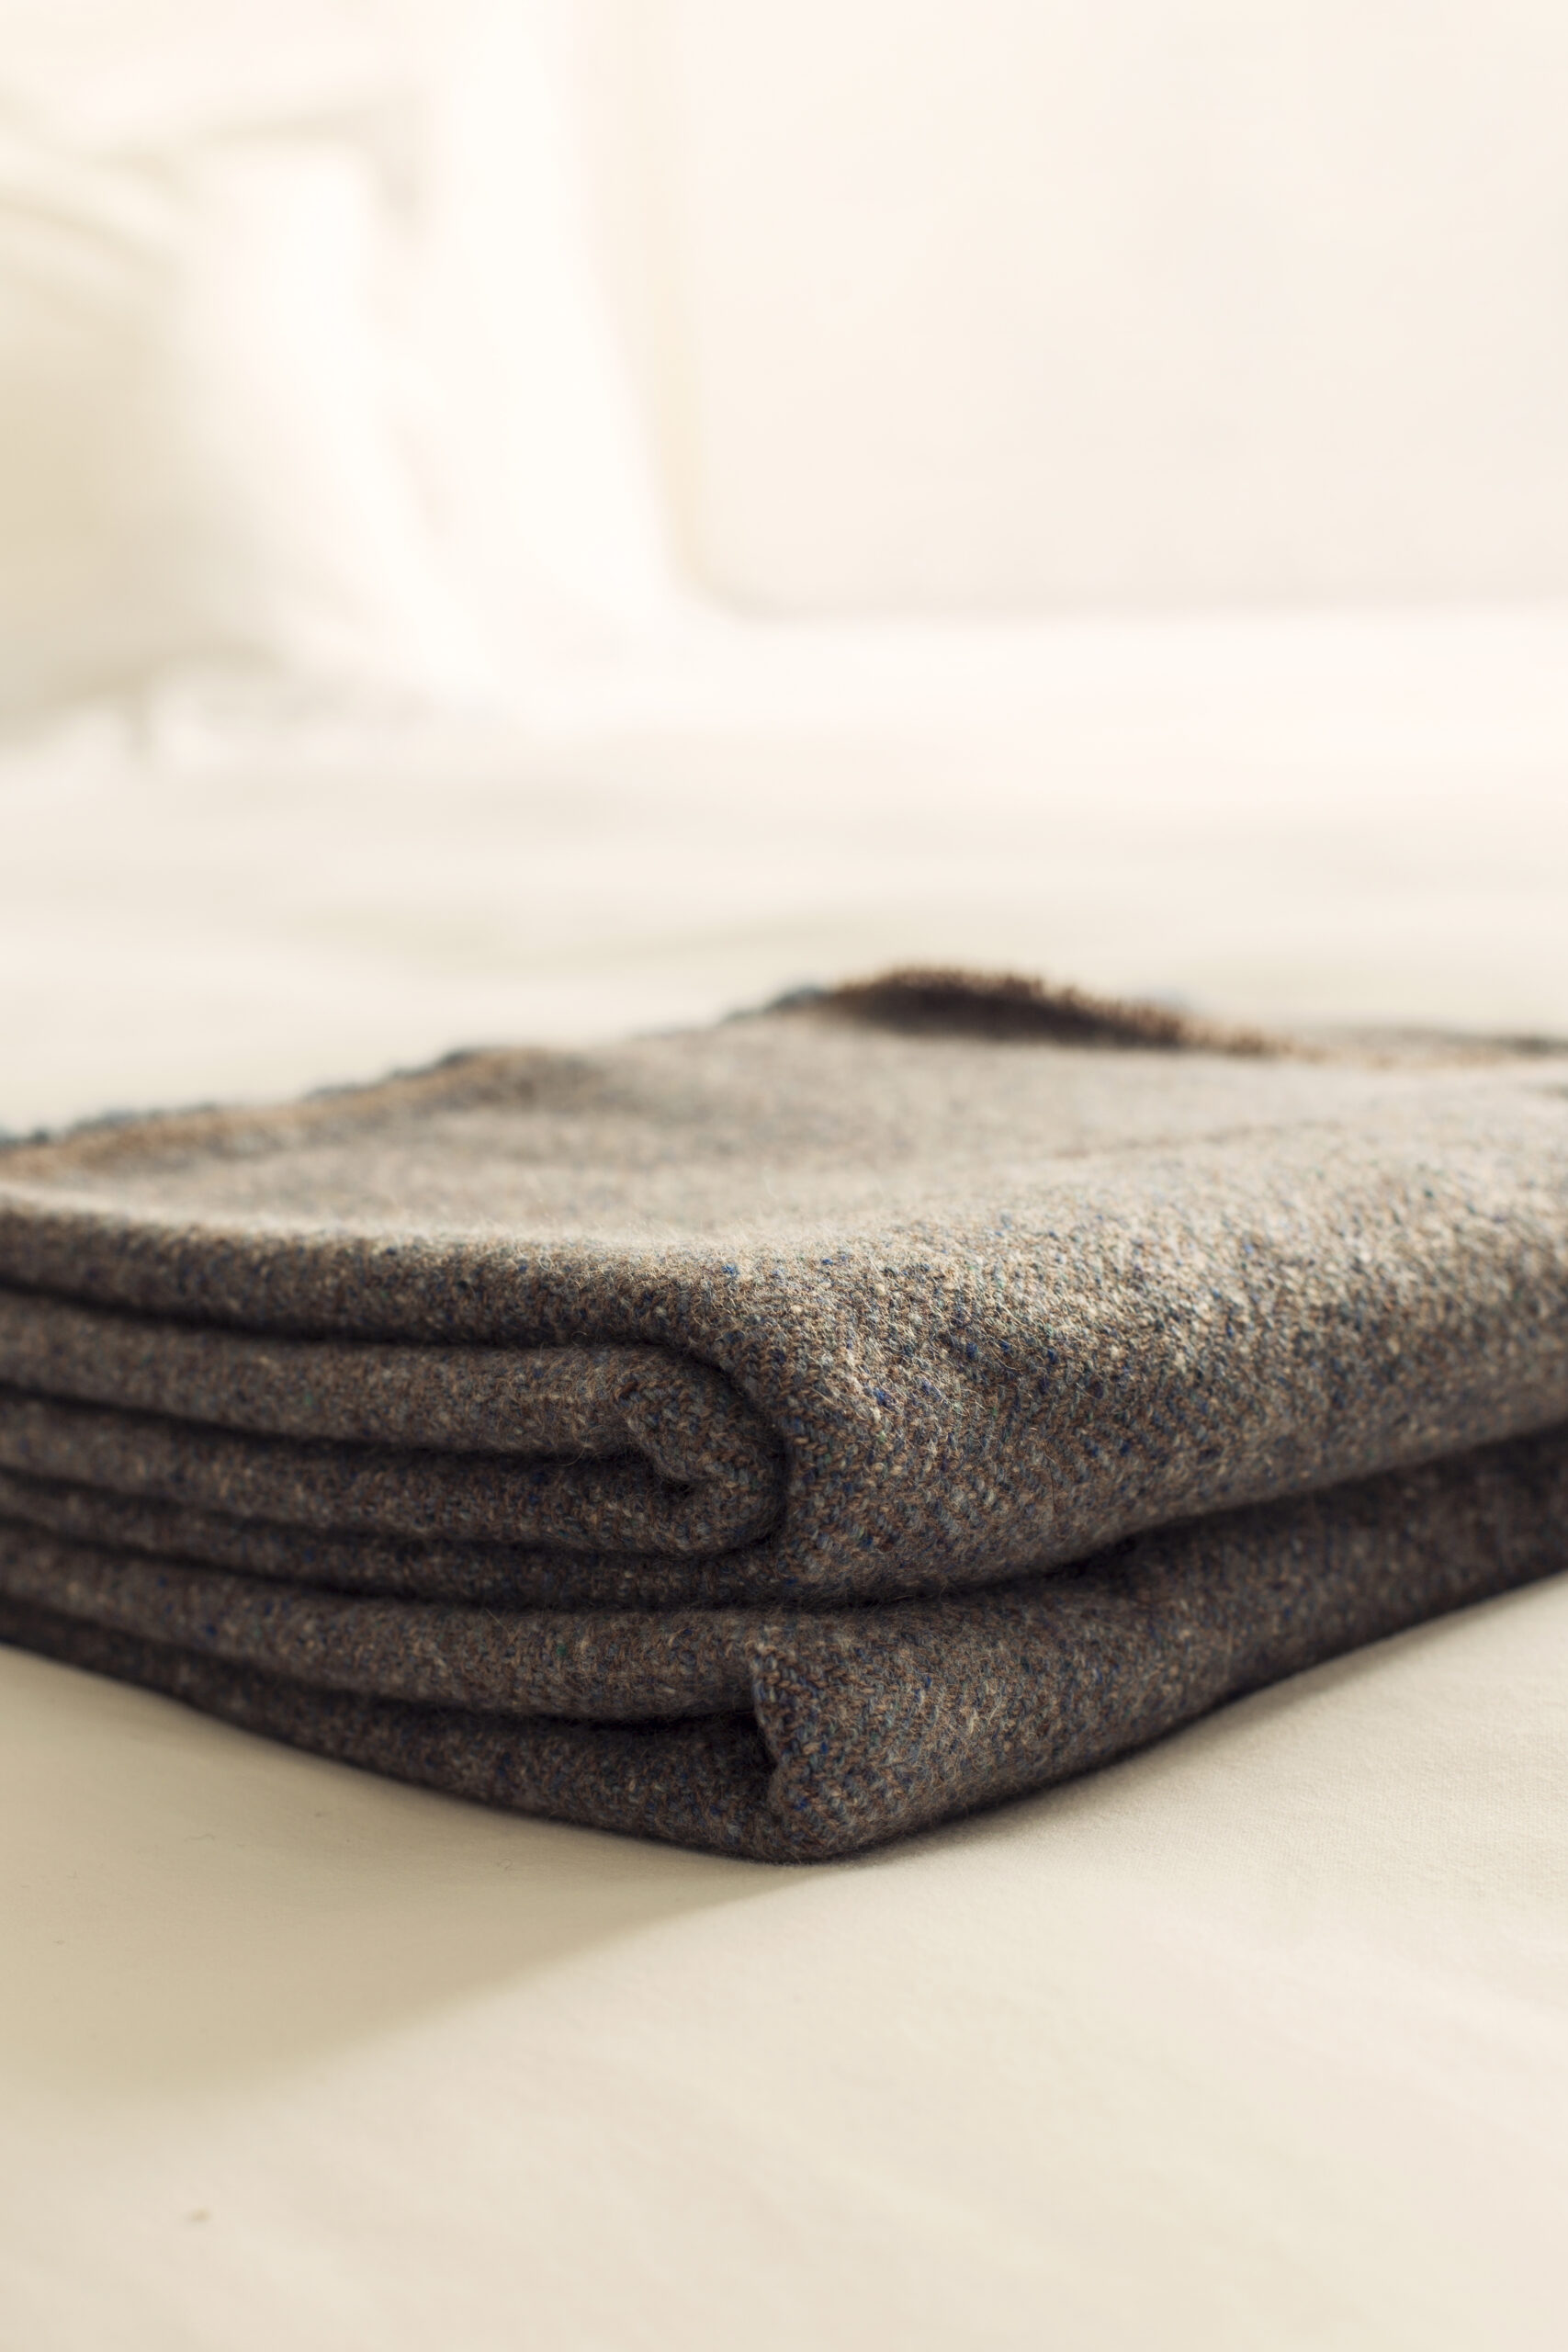 Ultimate Comfort Cashmere Blanket Szaro-Niebieski - Yoga Retreatment | JestemSlow.pl